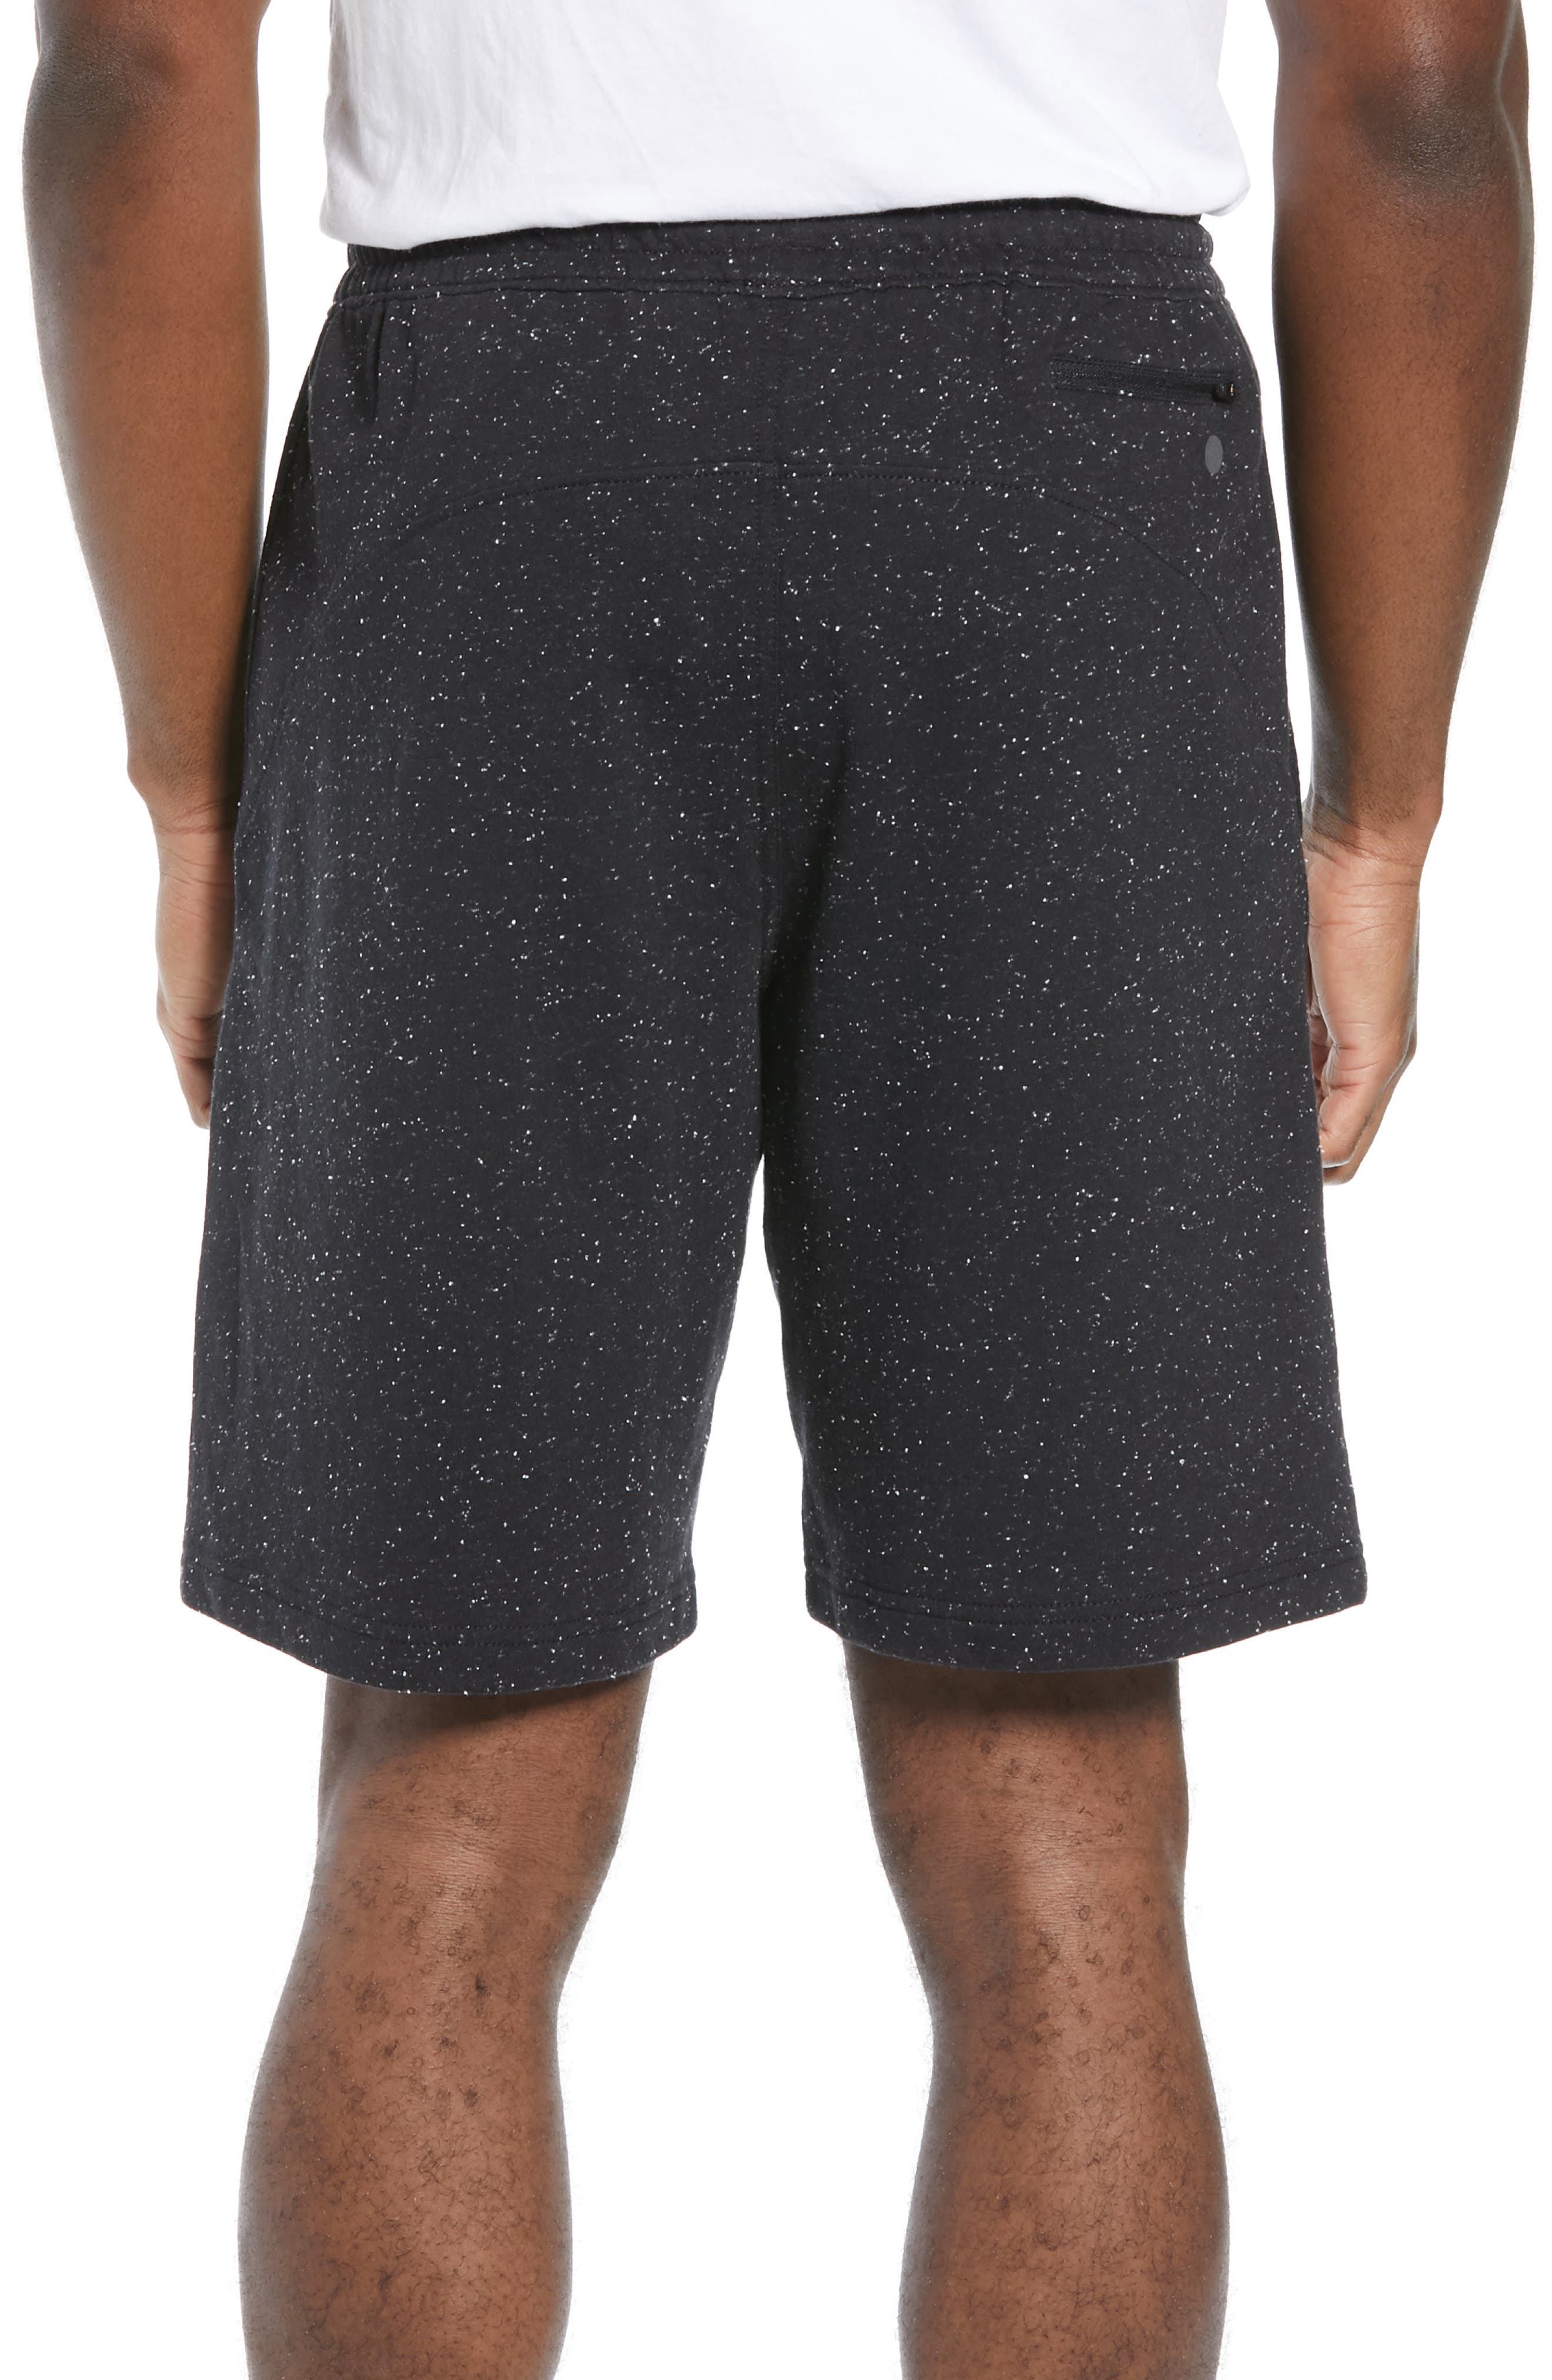 ZELLA, Neppy Fleece Athletic Shorts, Alternate thumbnail 2, color, 001